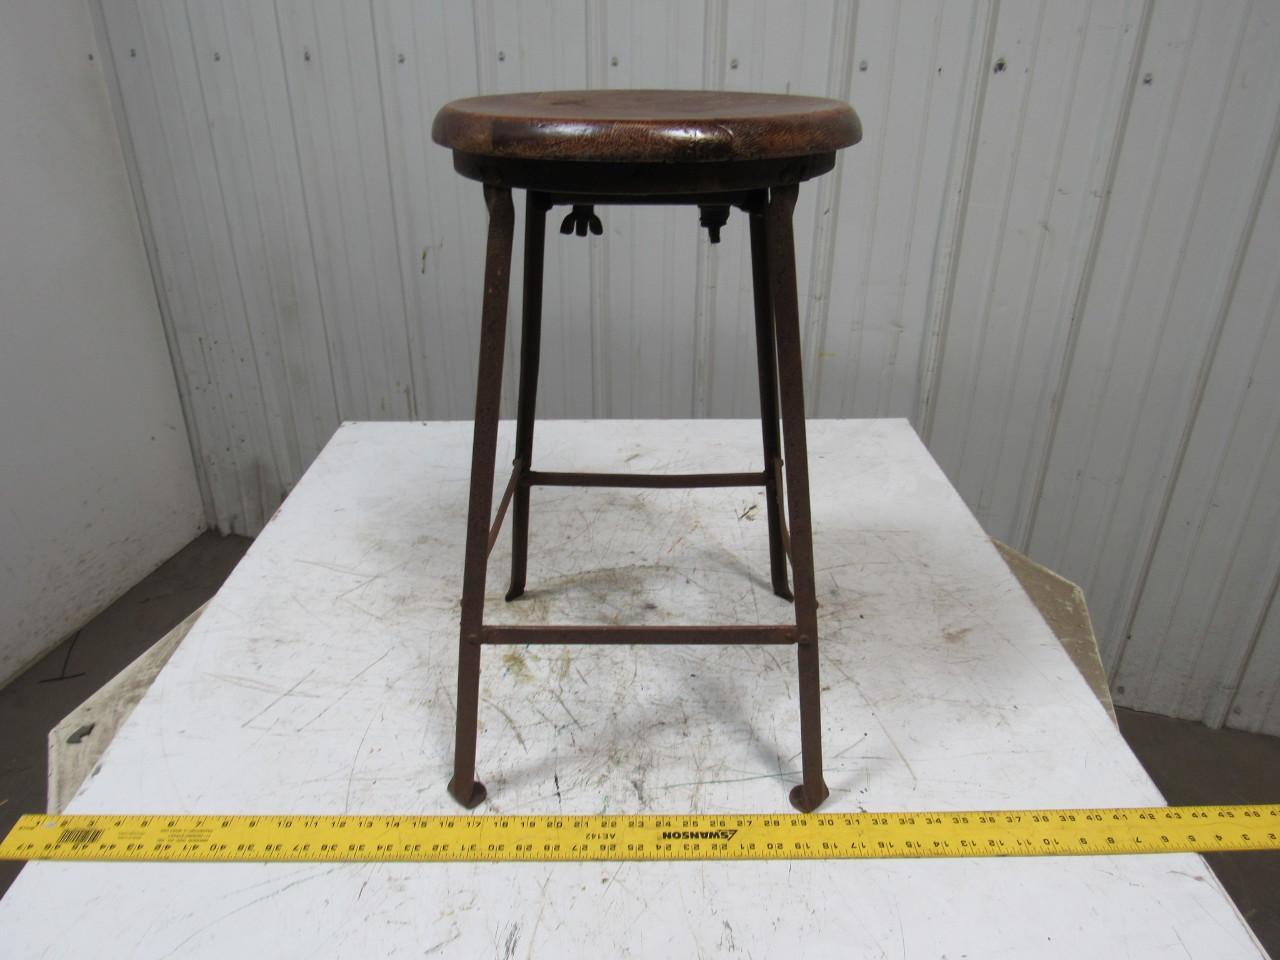 Vintage Steampunk Industrial Style Bar Stool Chair Angel  : 107670 vintage steampunk industrial style stool angel iron frame wooden seat from www.ebay.com size 1280 x 960 jpeg 229kB